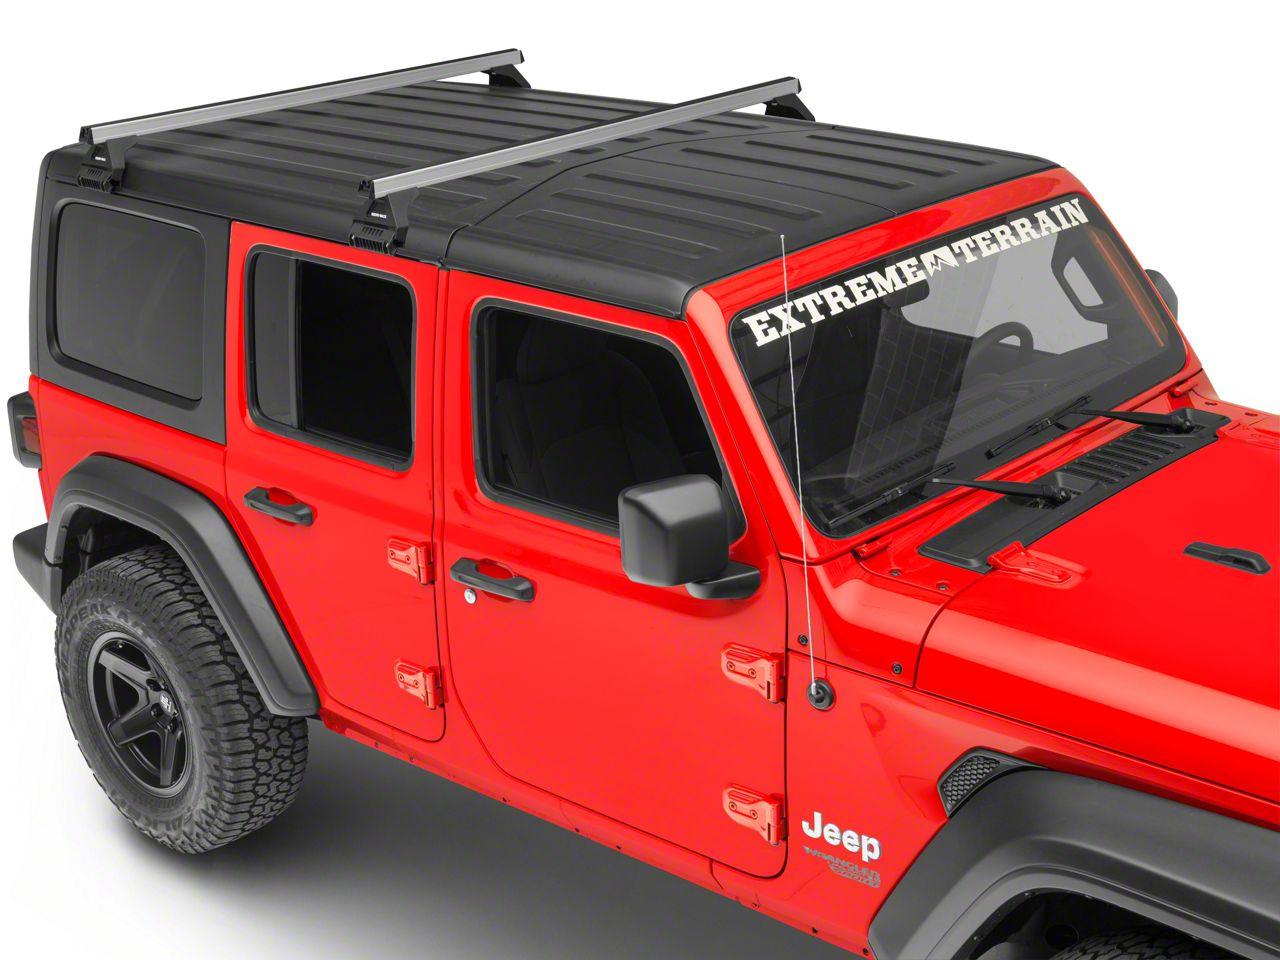 Rhino-Rack Heavy Duty RL110 2 Bar Roof Rack - Silver (2018 Jeep Wrangler JL 4 Door)